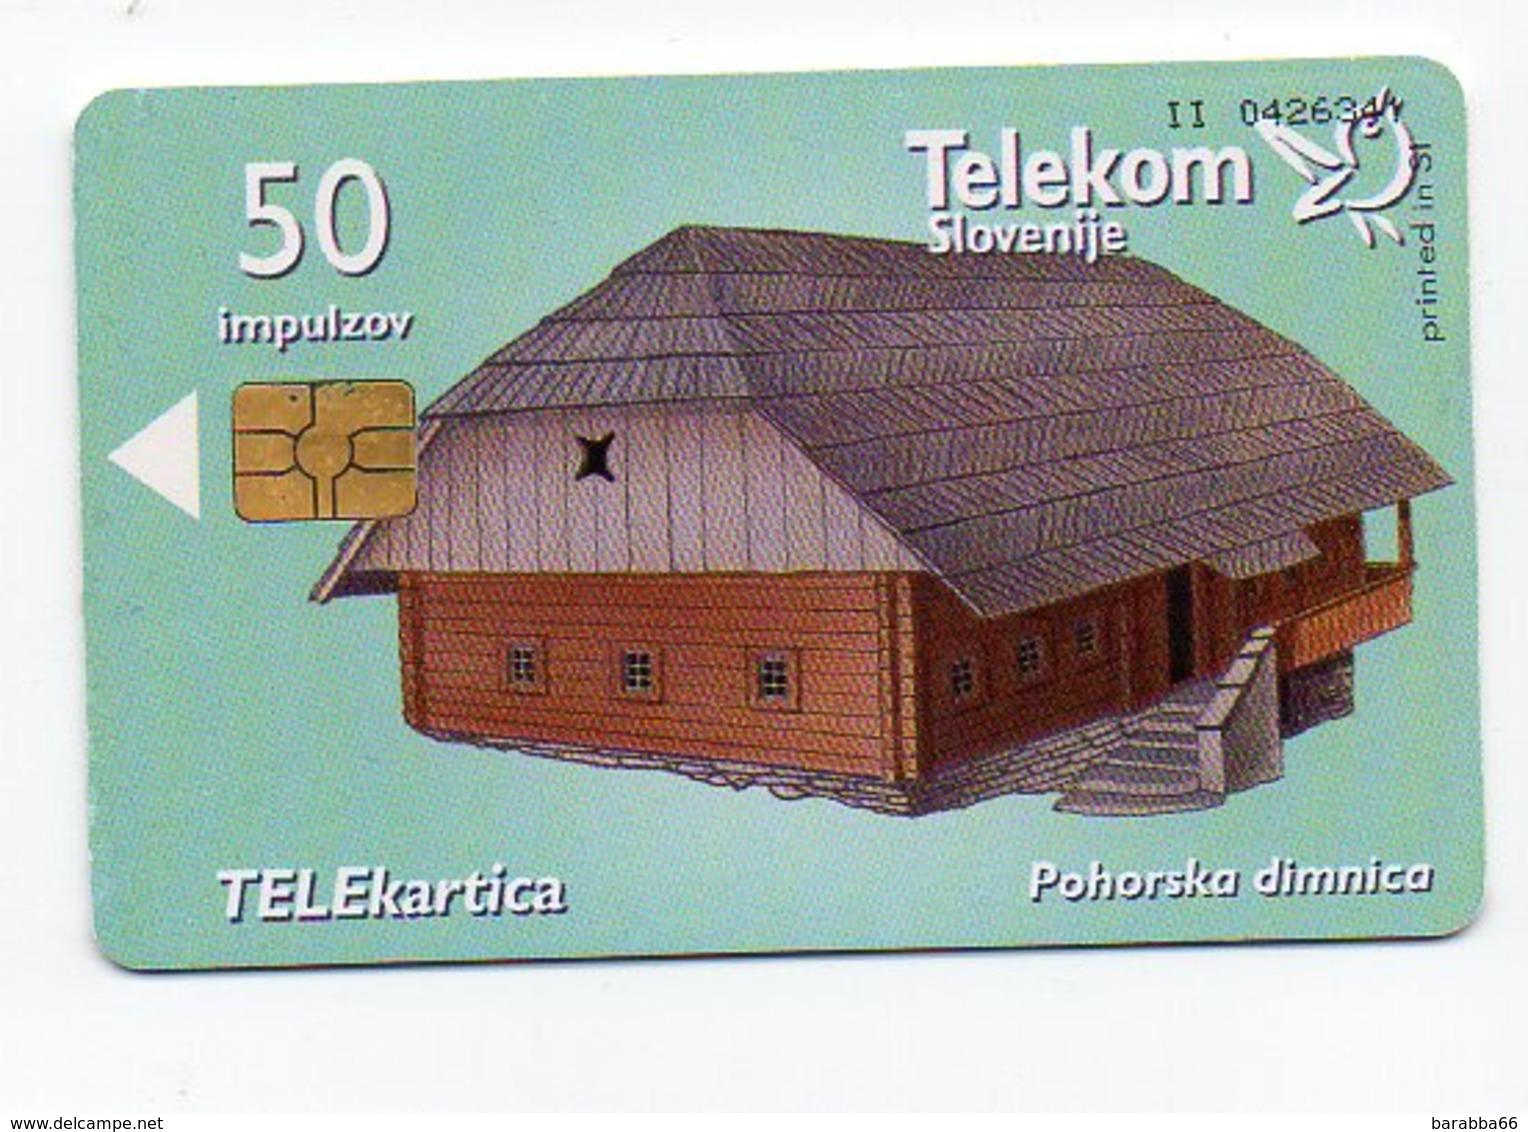 Telekom Slovenije 50 Imp. - BUILDINGS - Slowenien